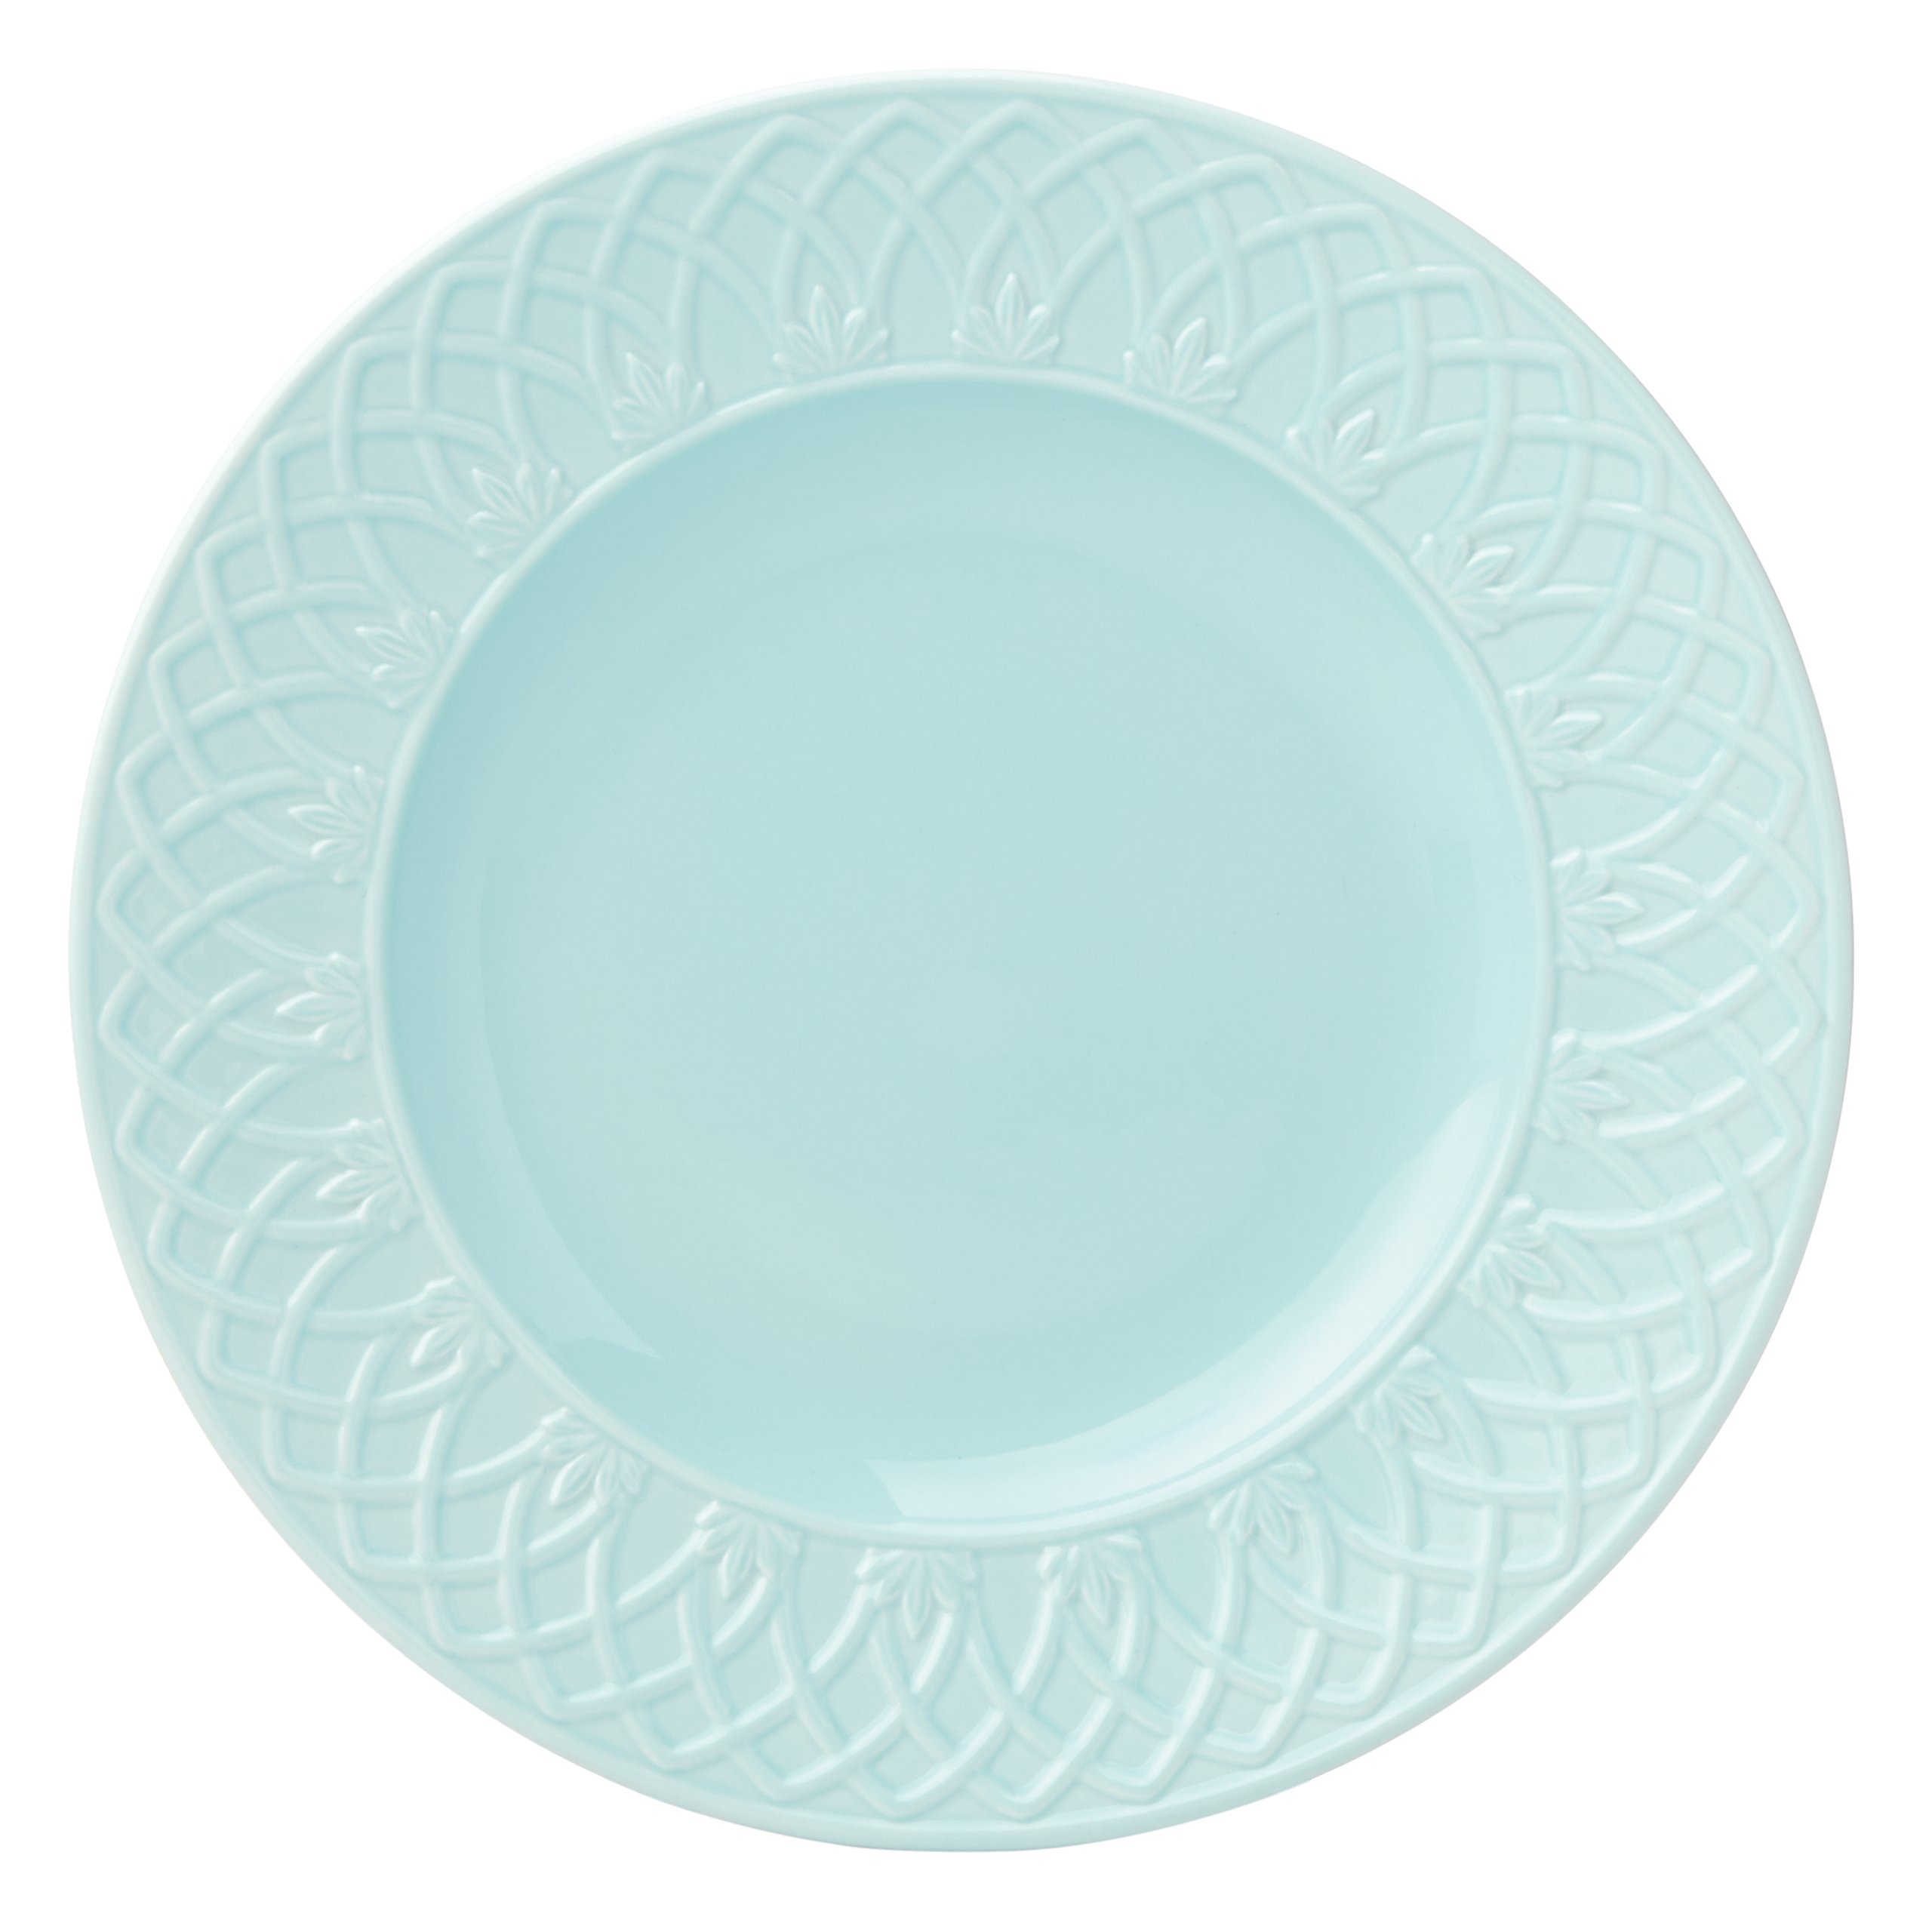 Lenox British Colonial Carved Accent/Salad Plate, Aqua